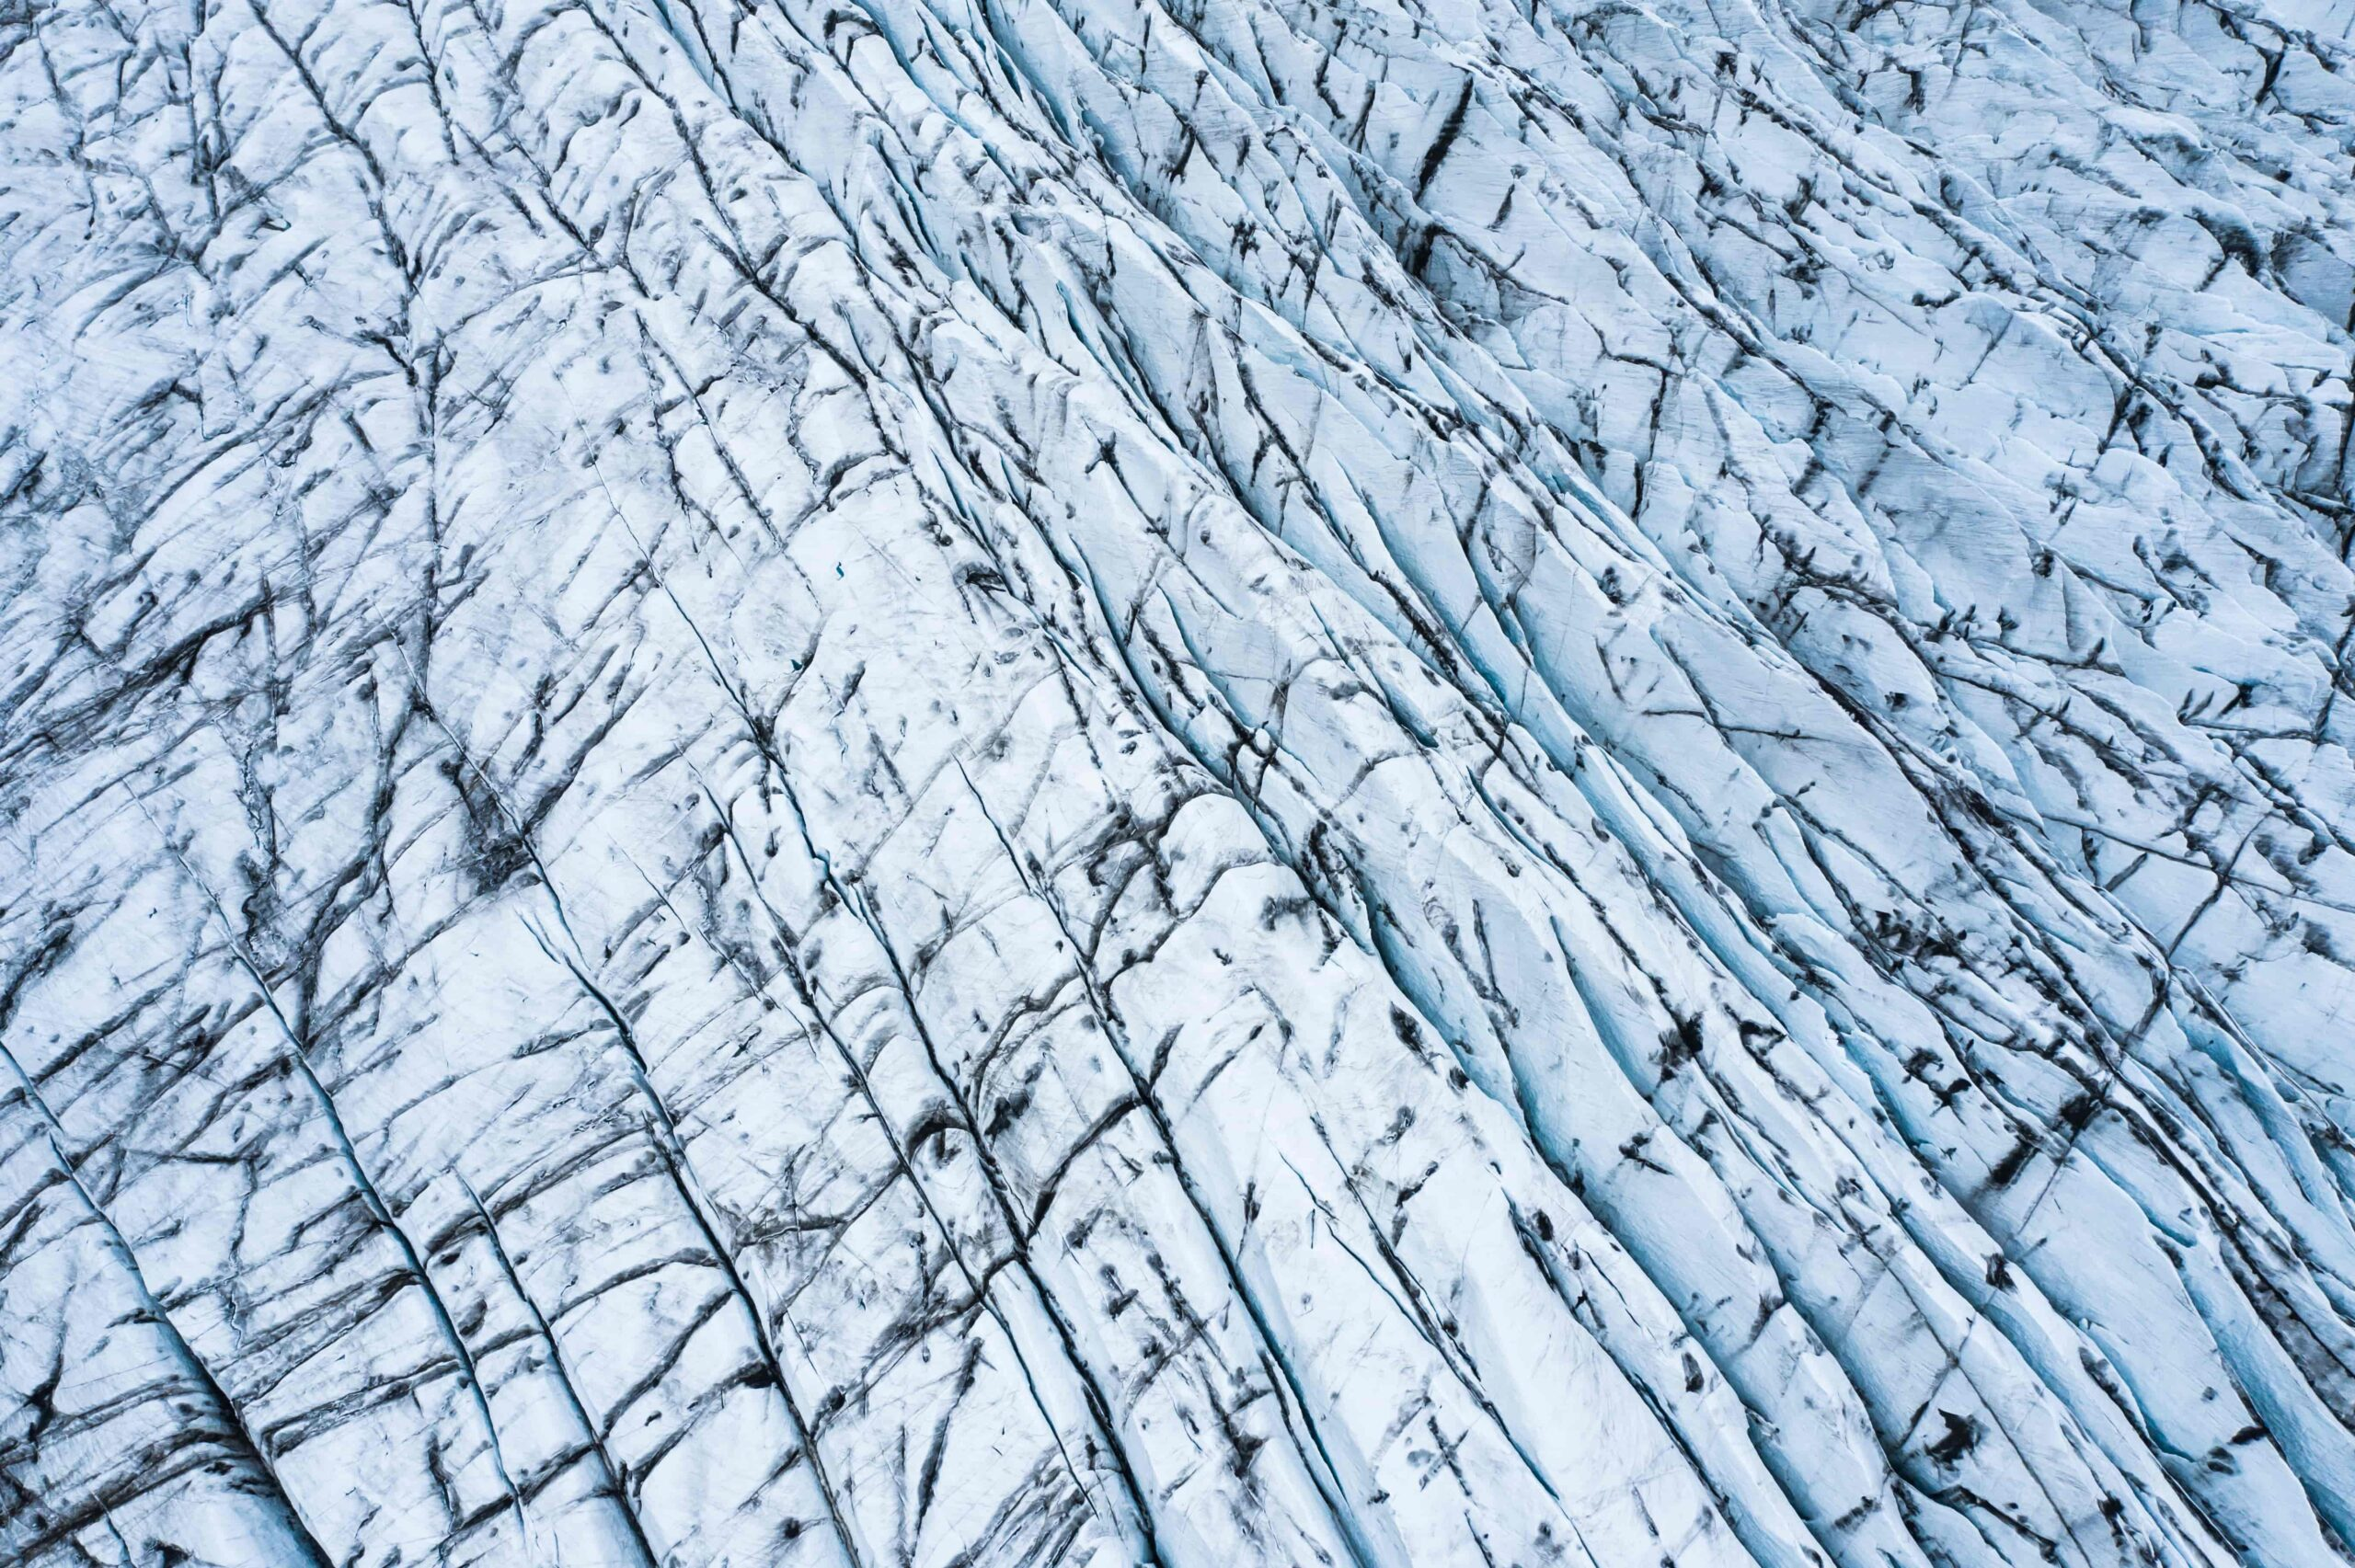 Vatnajokull glacier seen from above